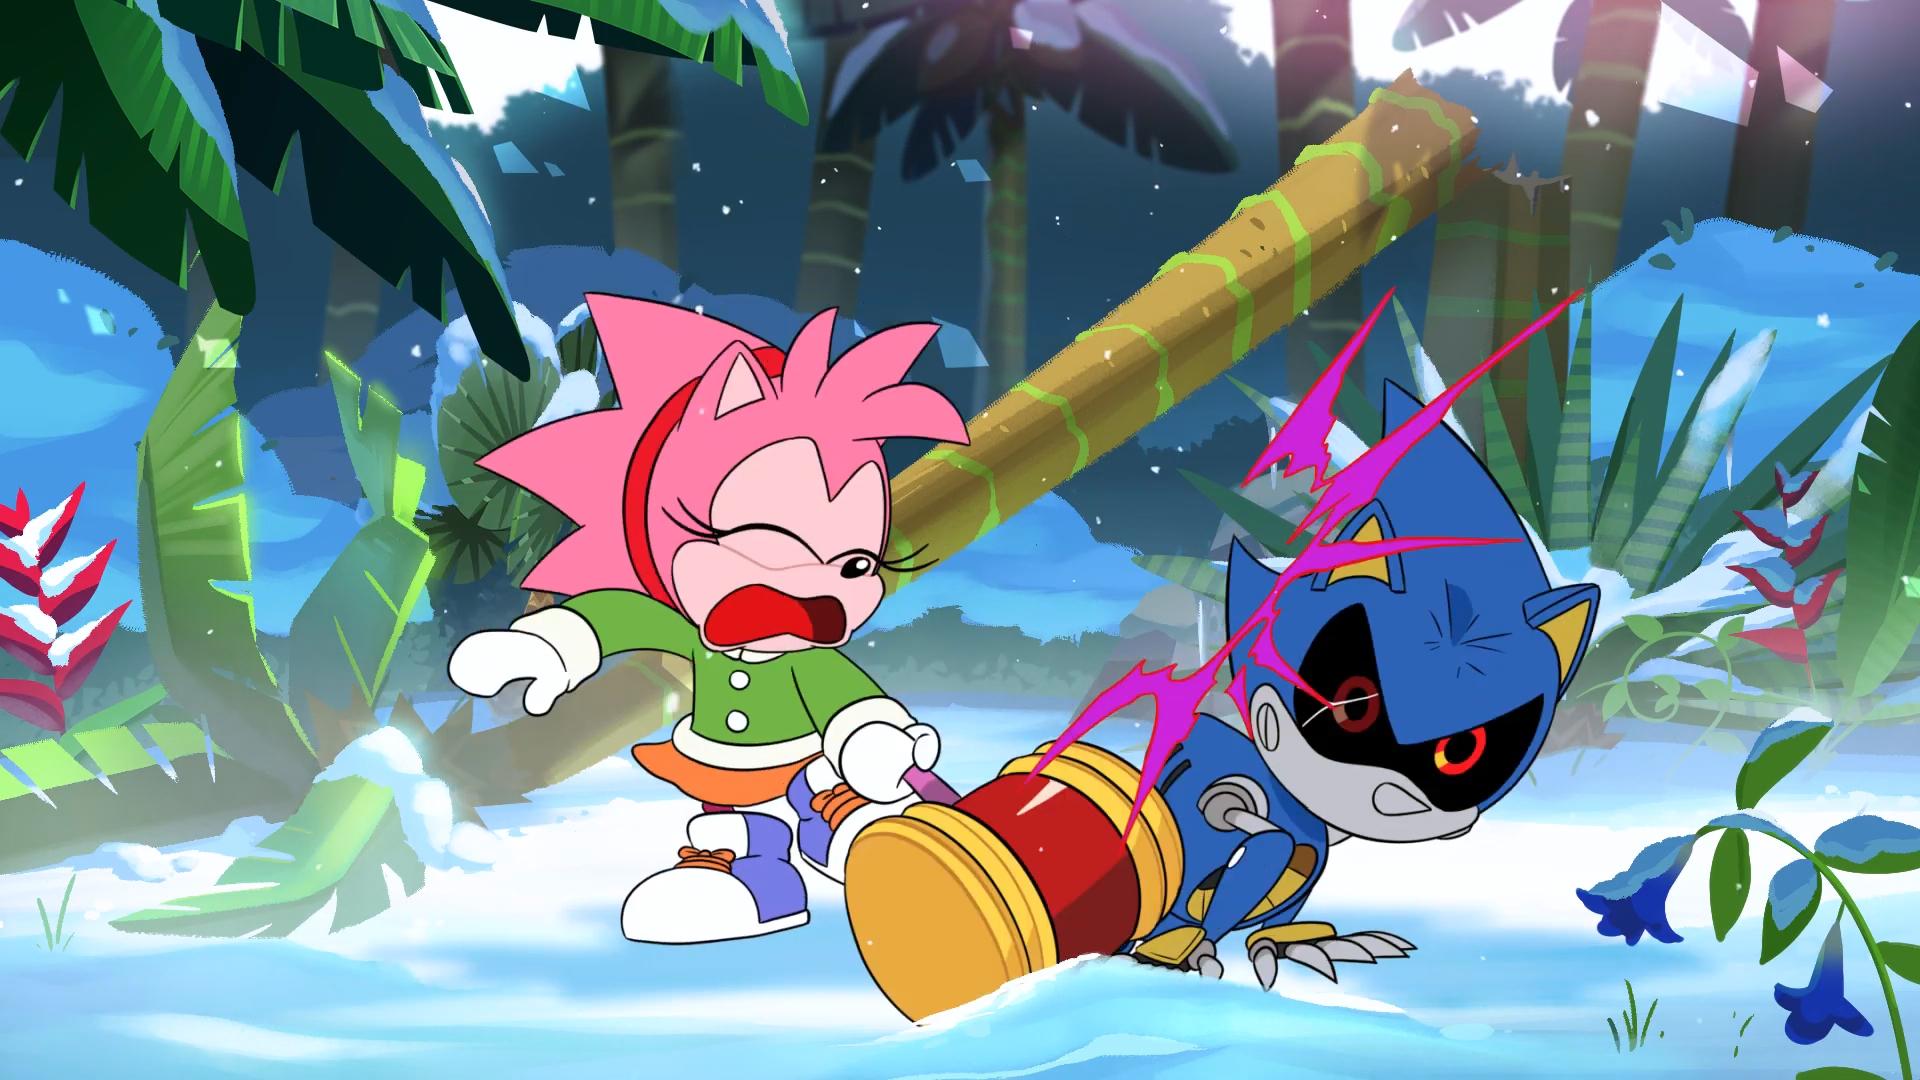 Piko Piko Hammer Classic Sonic S World Sonic News Network Fandom